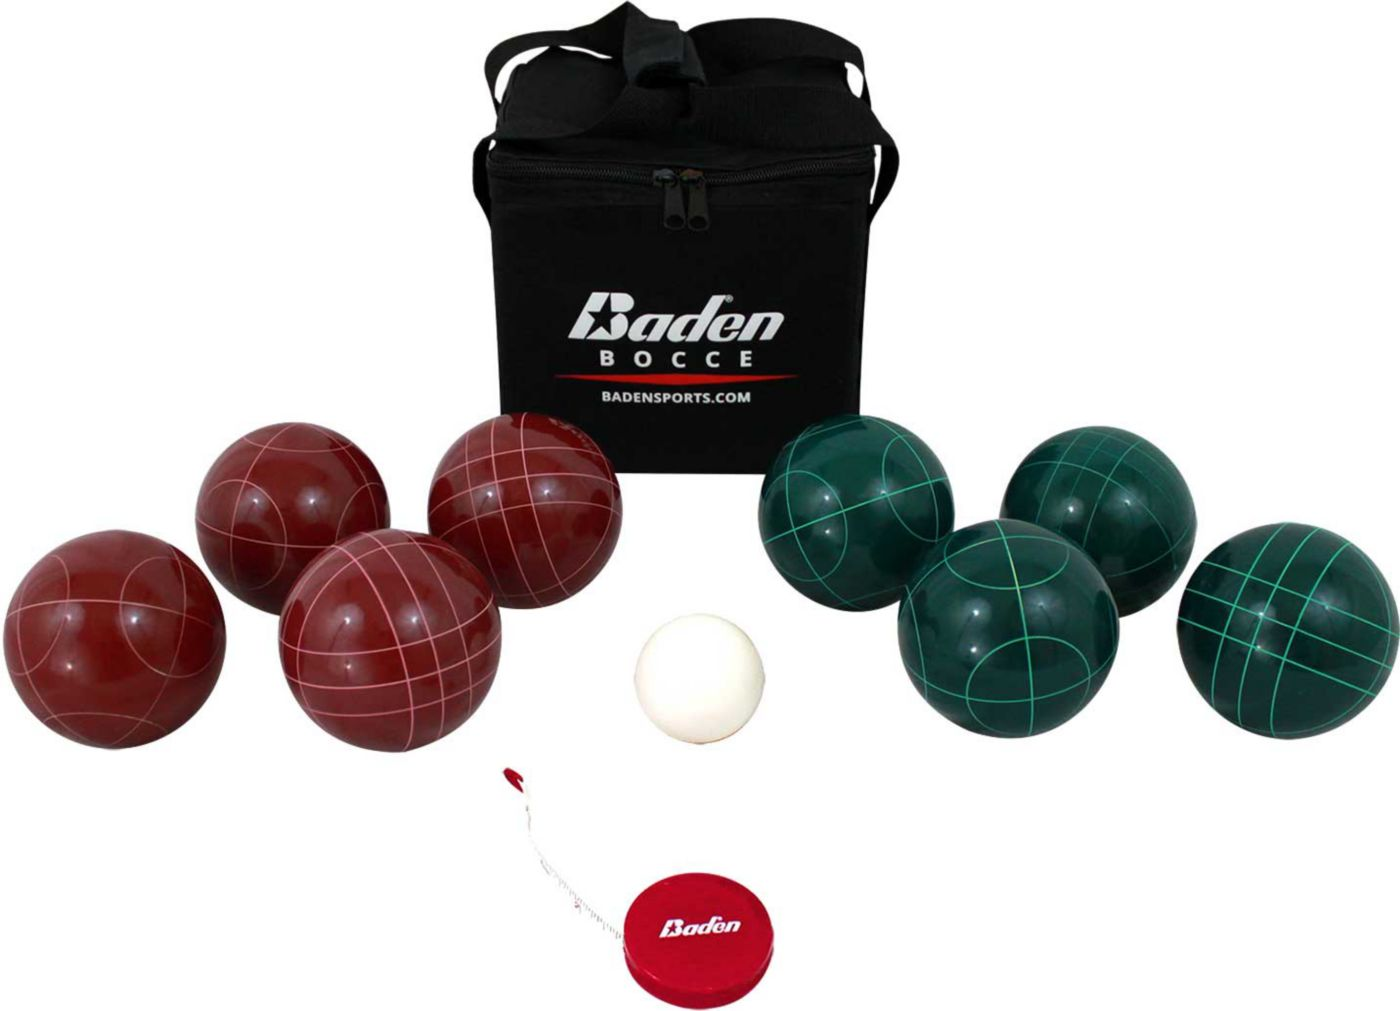 Baden Champions Bocce Ball 90mm Set